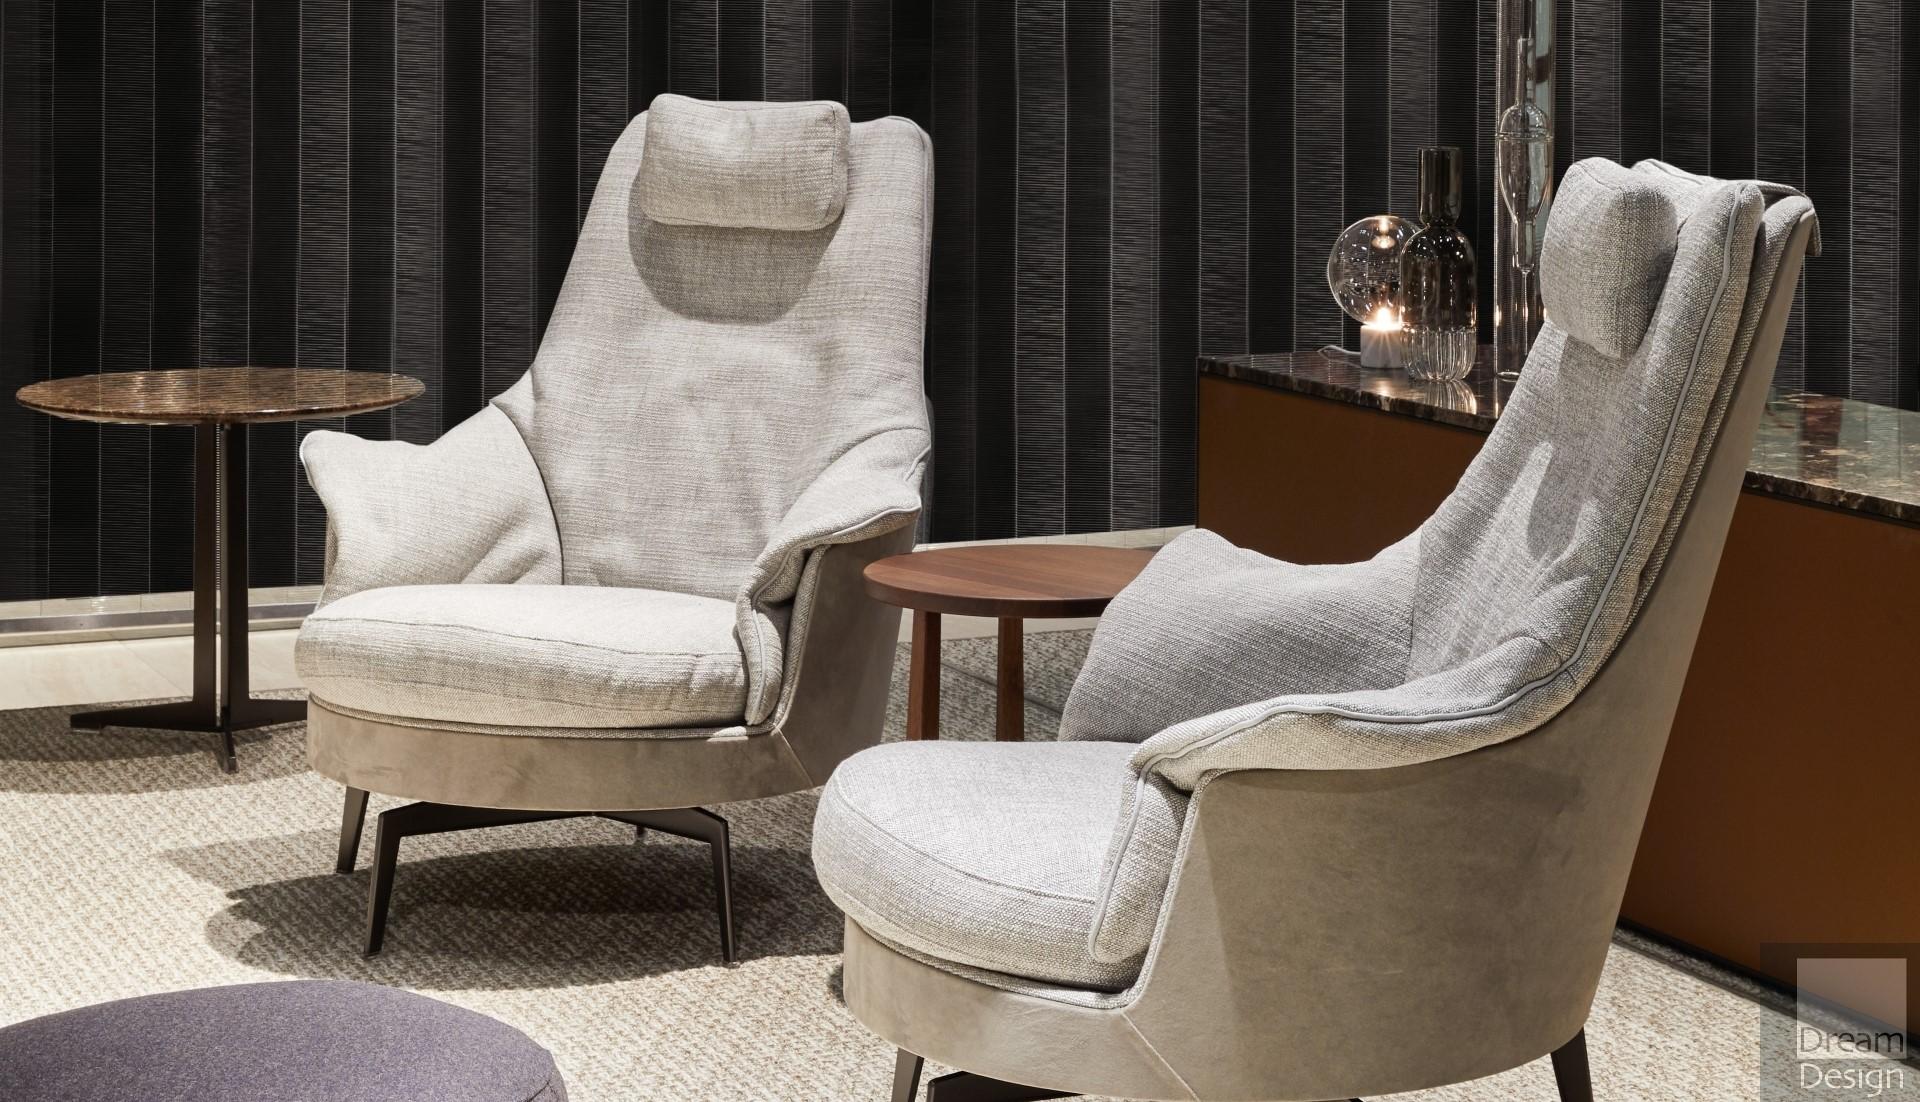 Flexform Guscioalto Light Armchair Dream Design